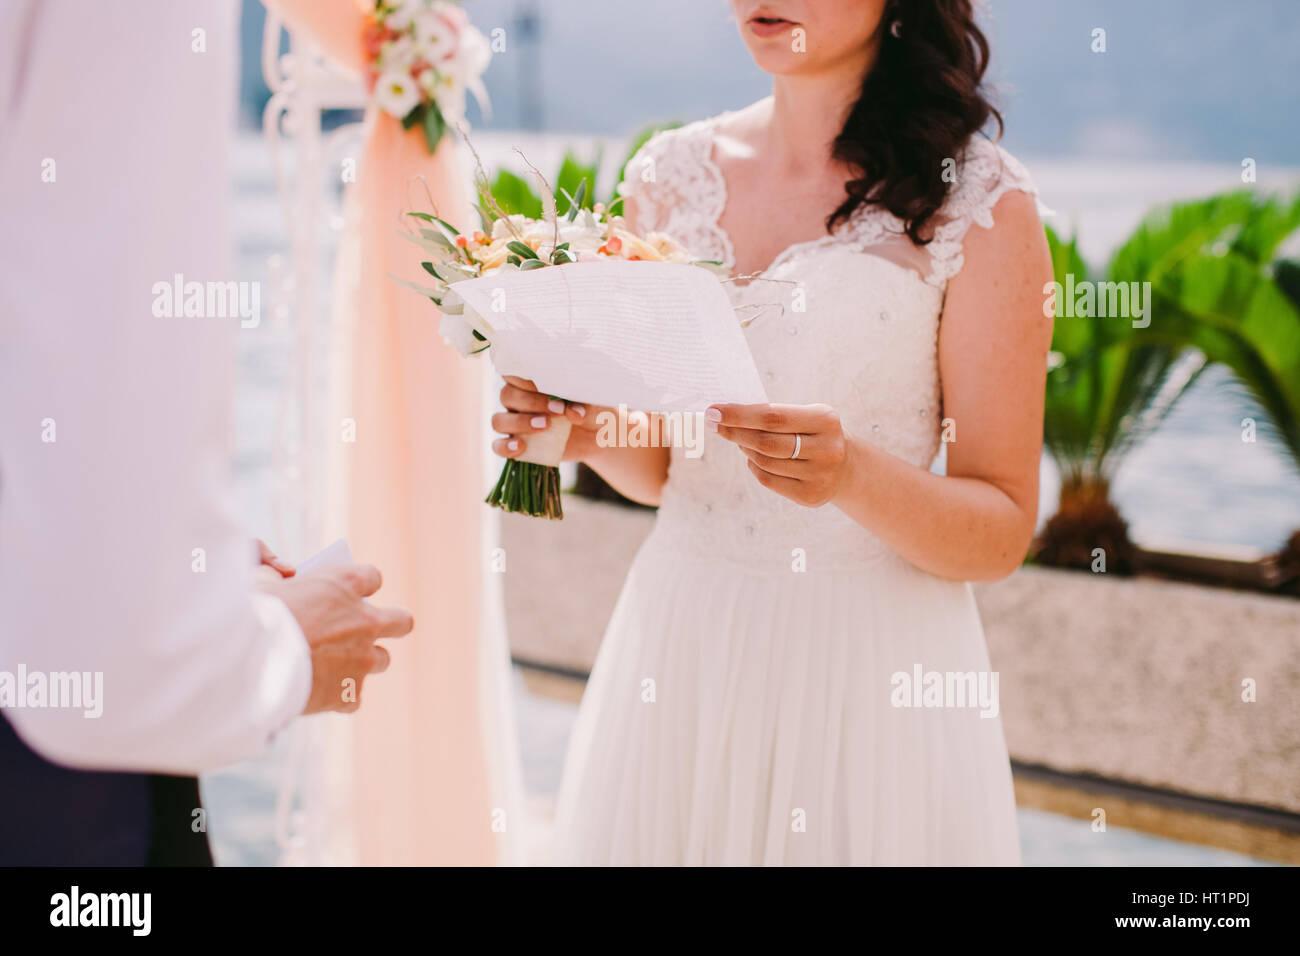 bride reading wedding vows. Wedding ceremony Stock Photo: 135263902 ...